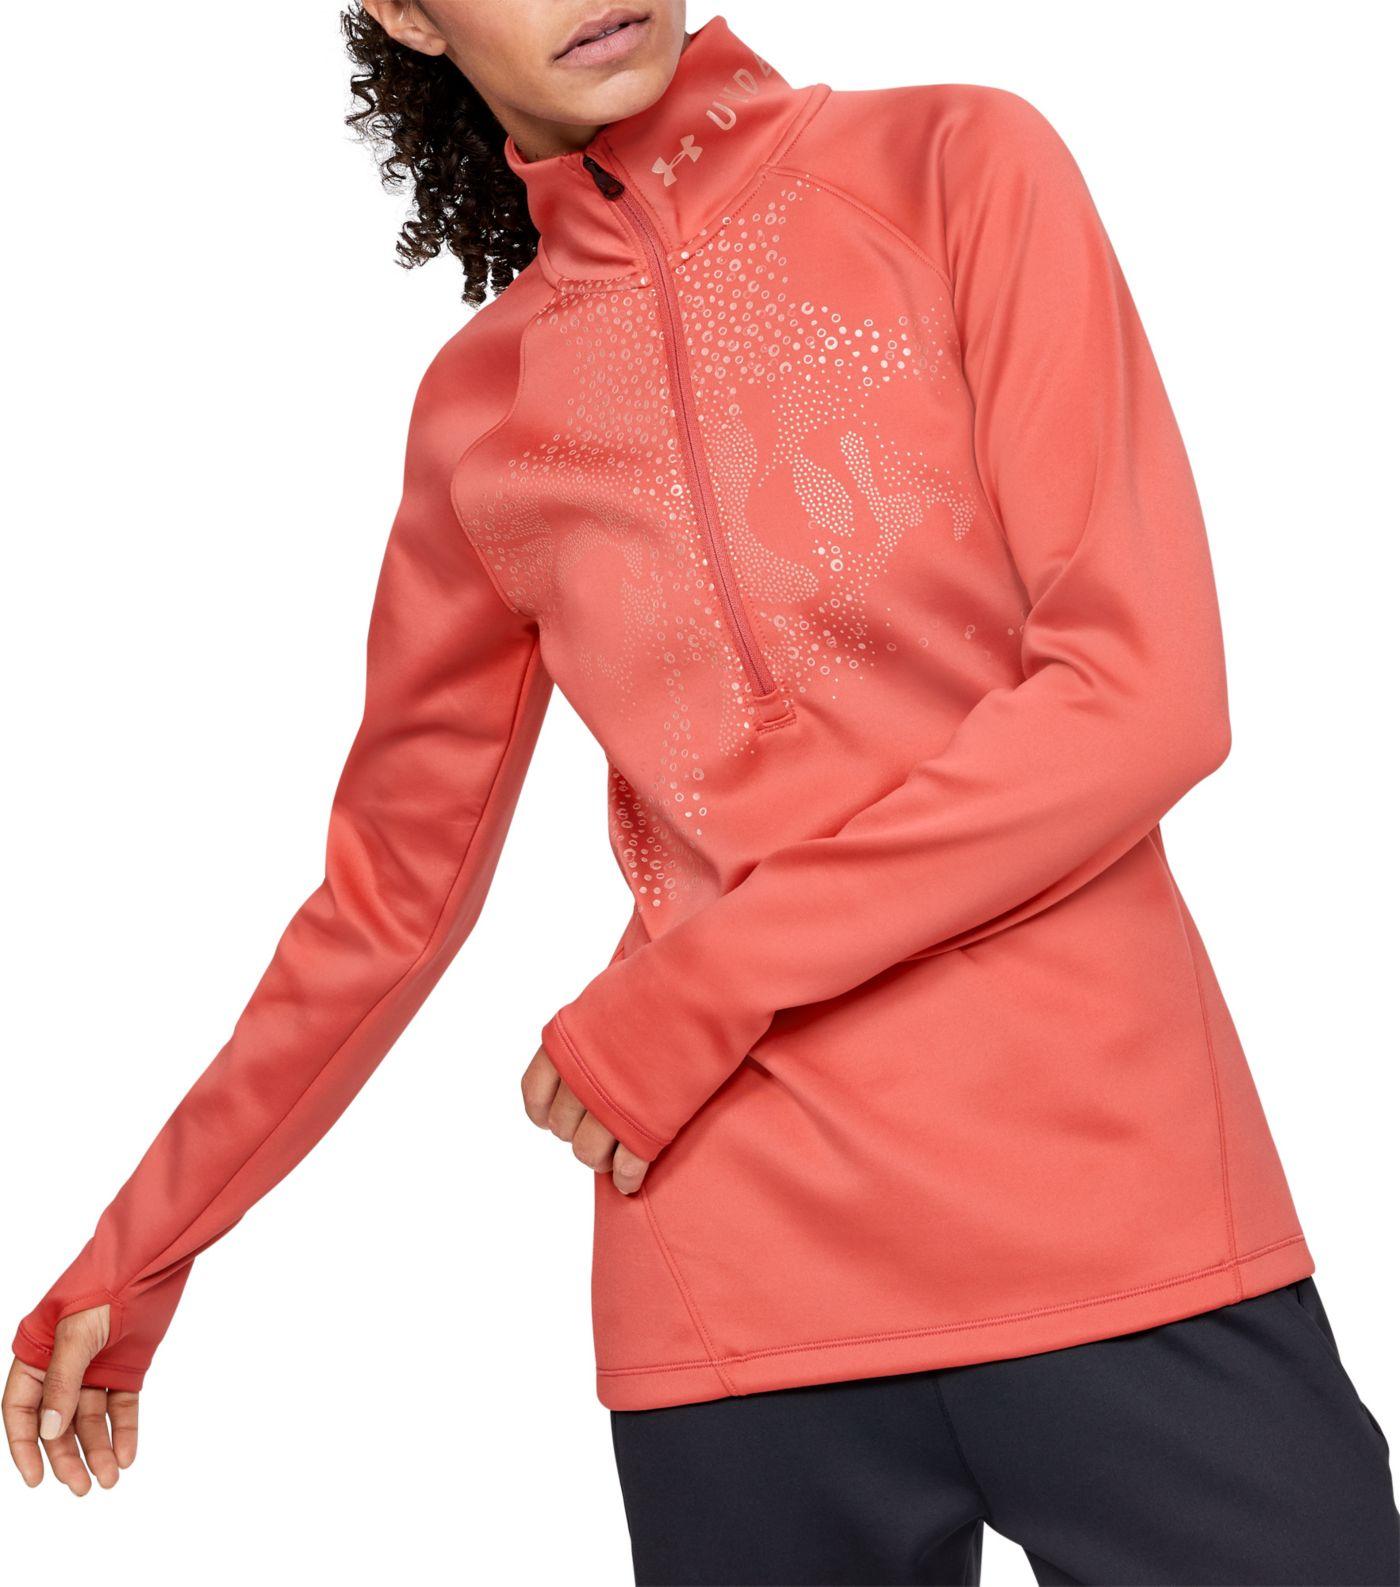 Under Armour Women's ColdGear Armour ½ Zip Graphic Long Sleeve Shirt